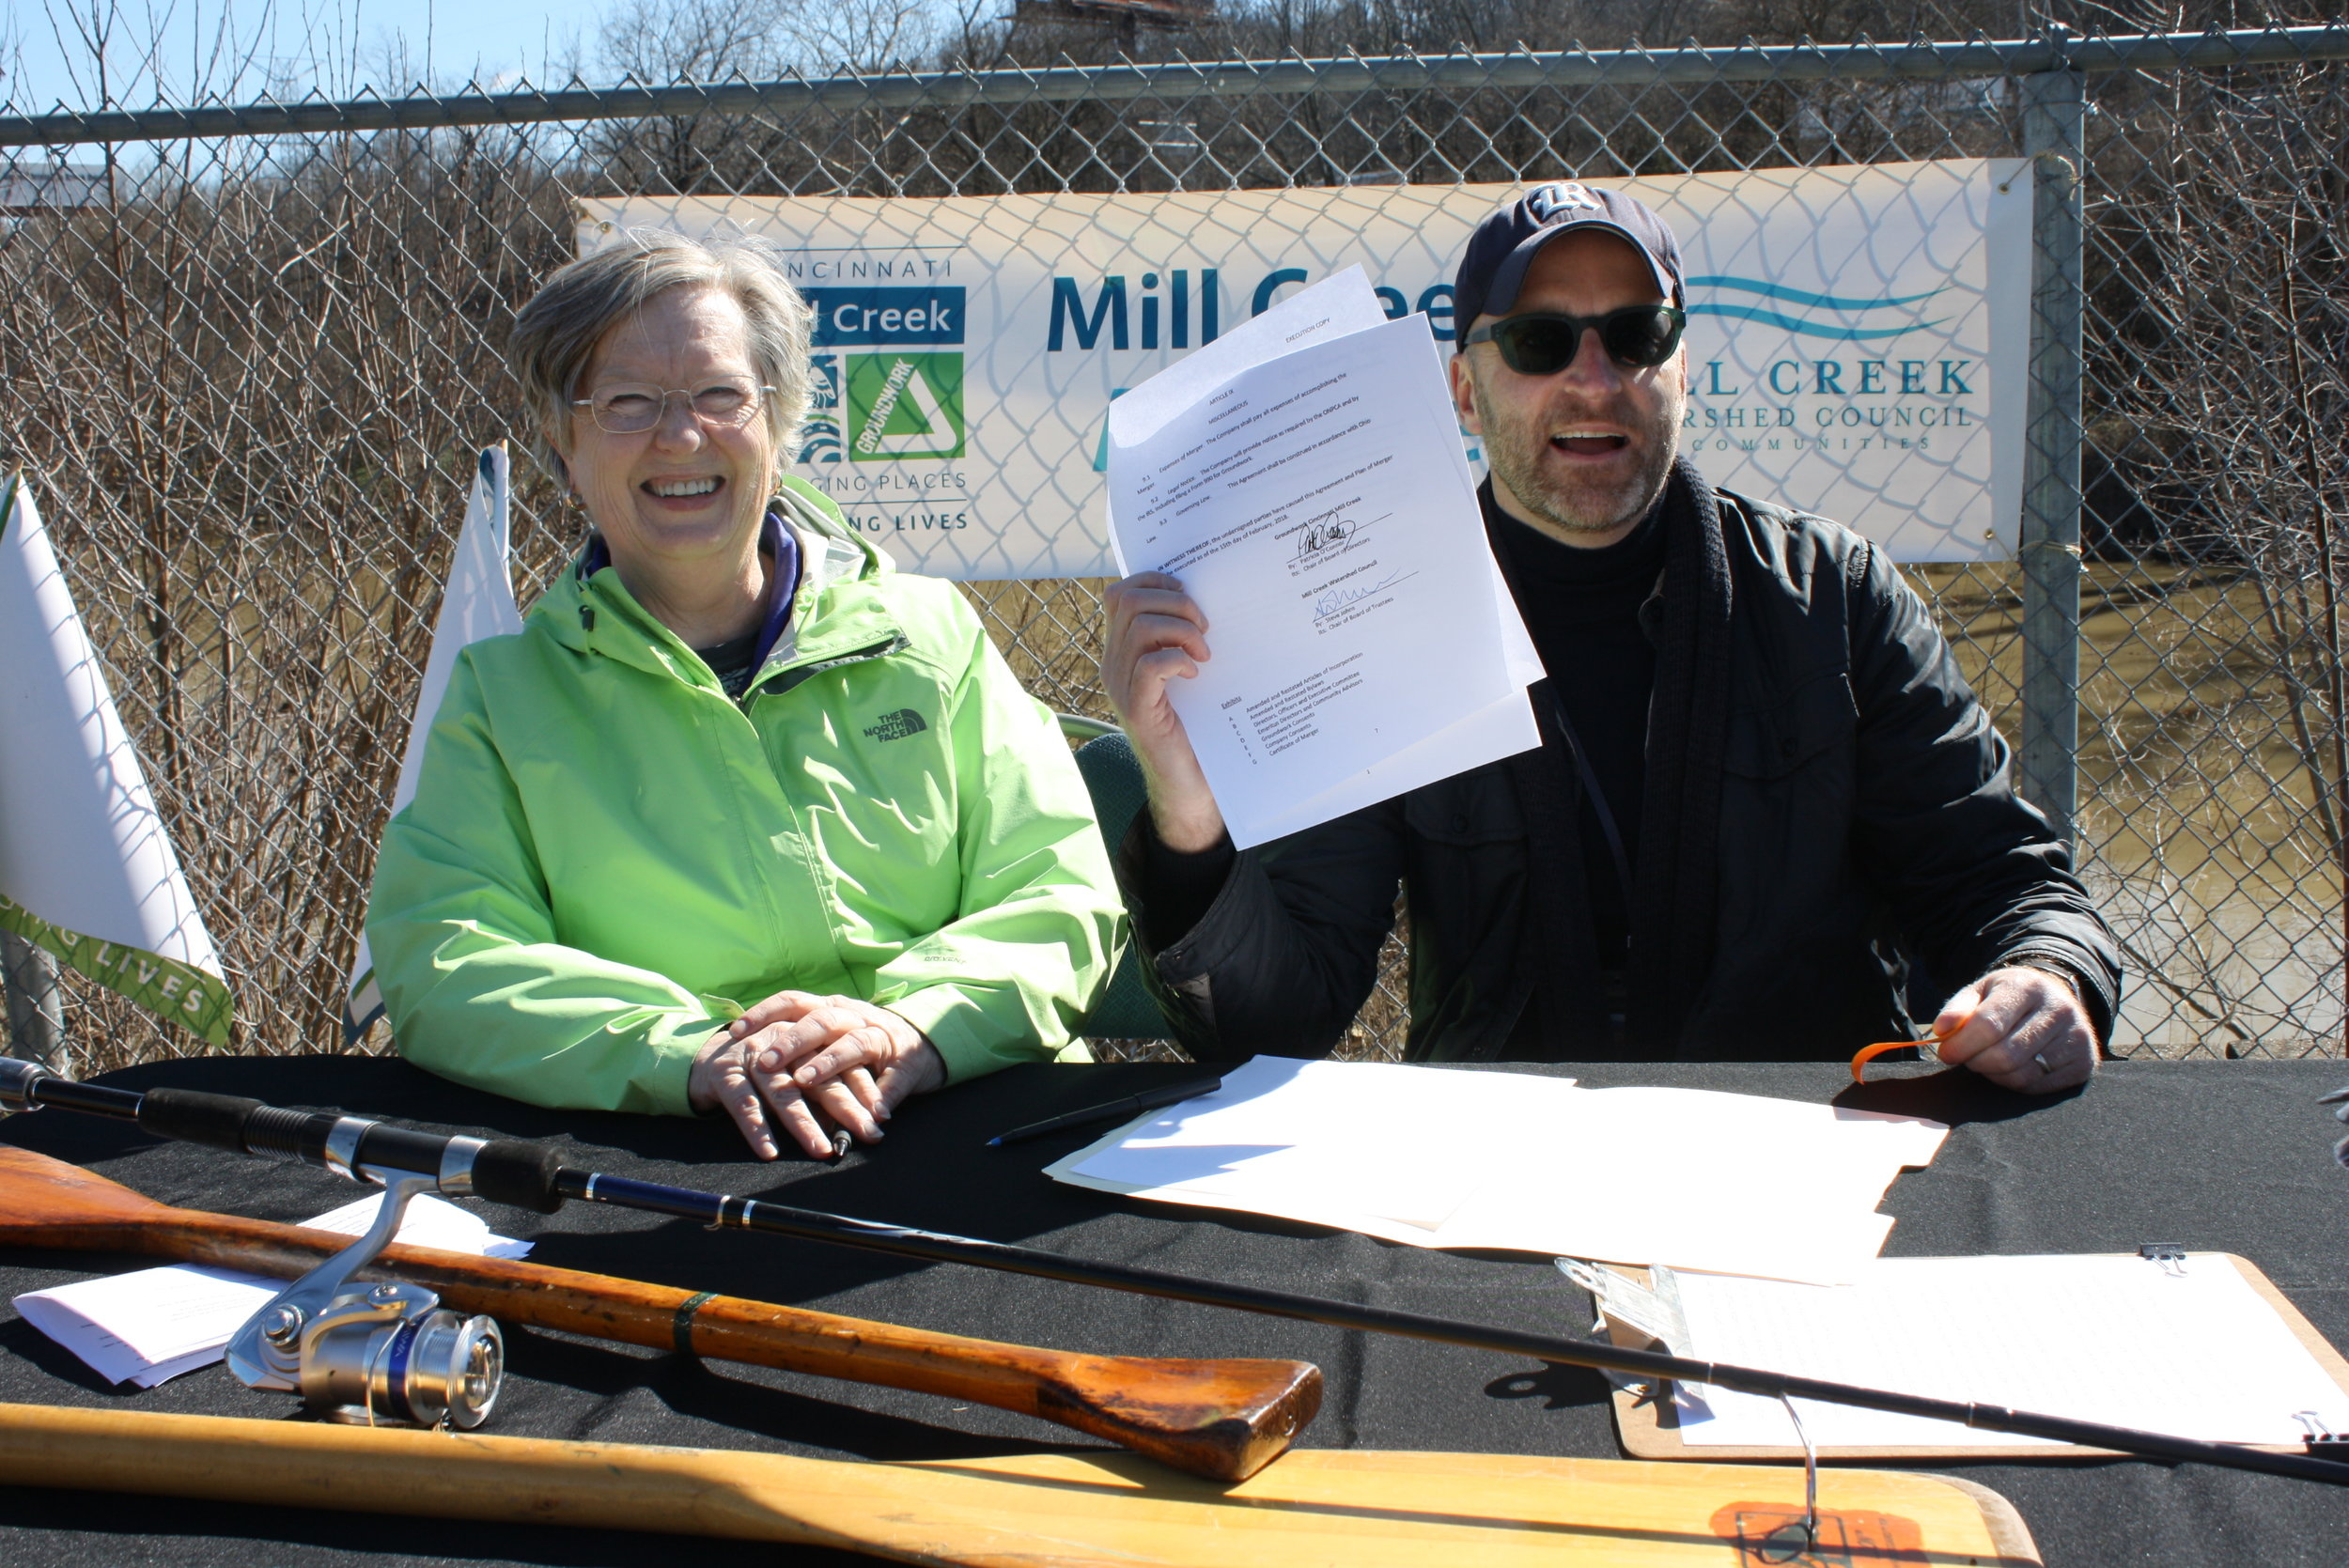 Mill Creek Alliance - press conf - Pat & Steve with document.JPG